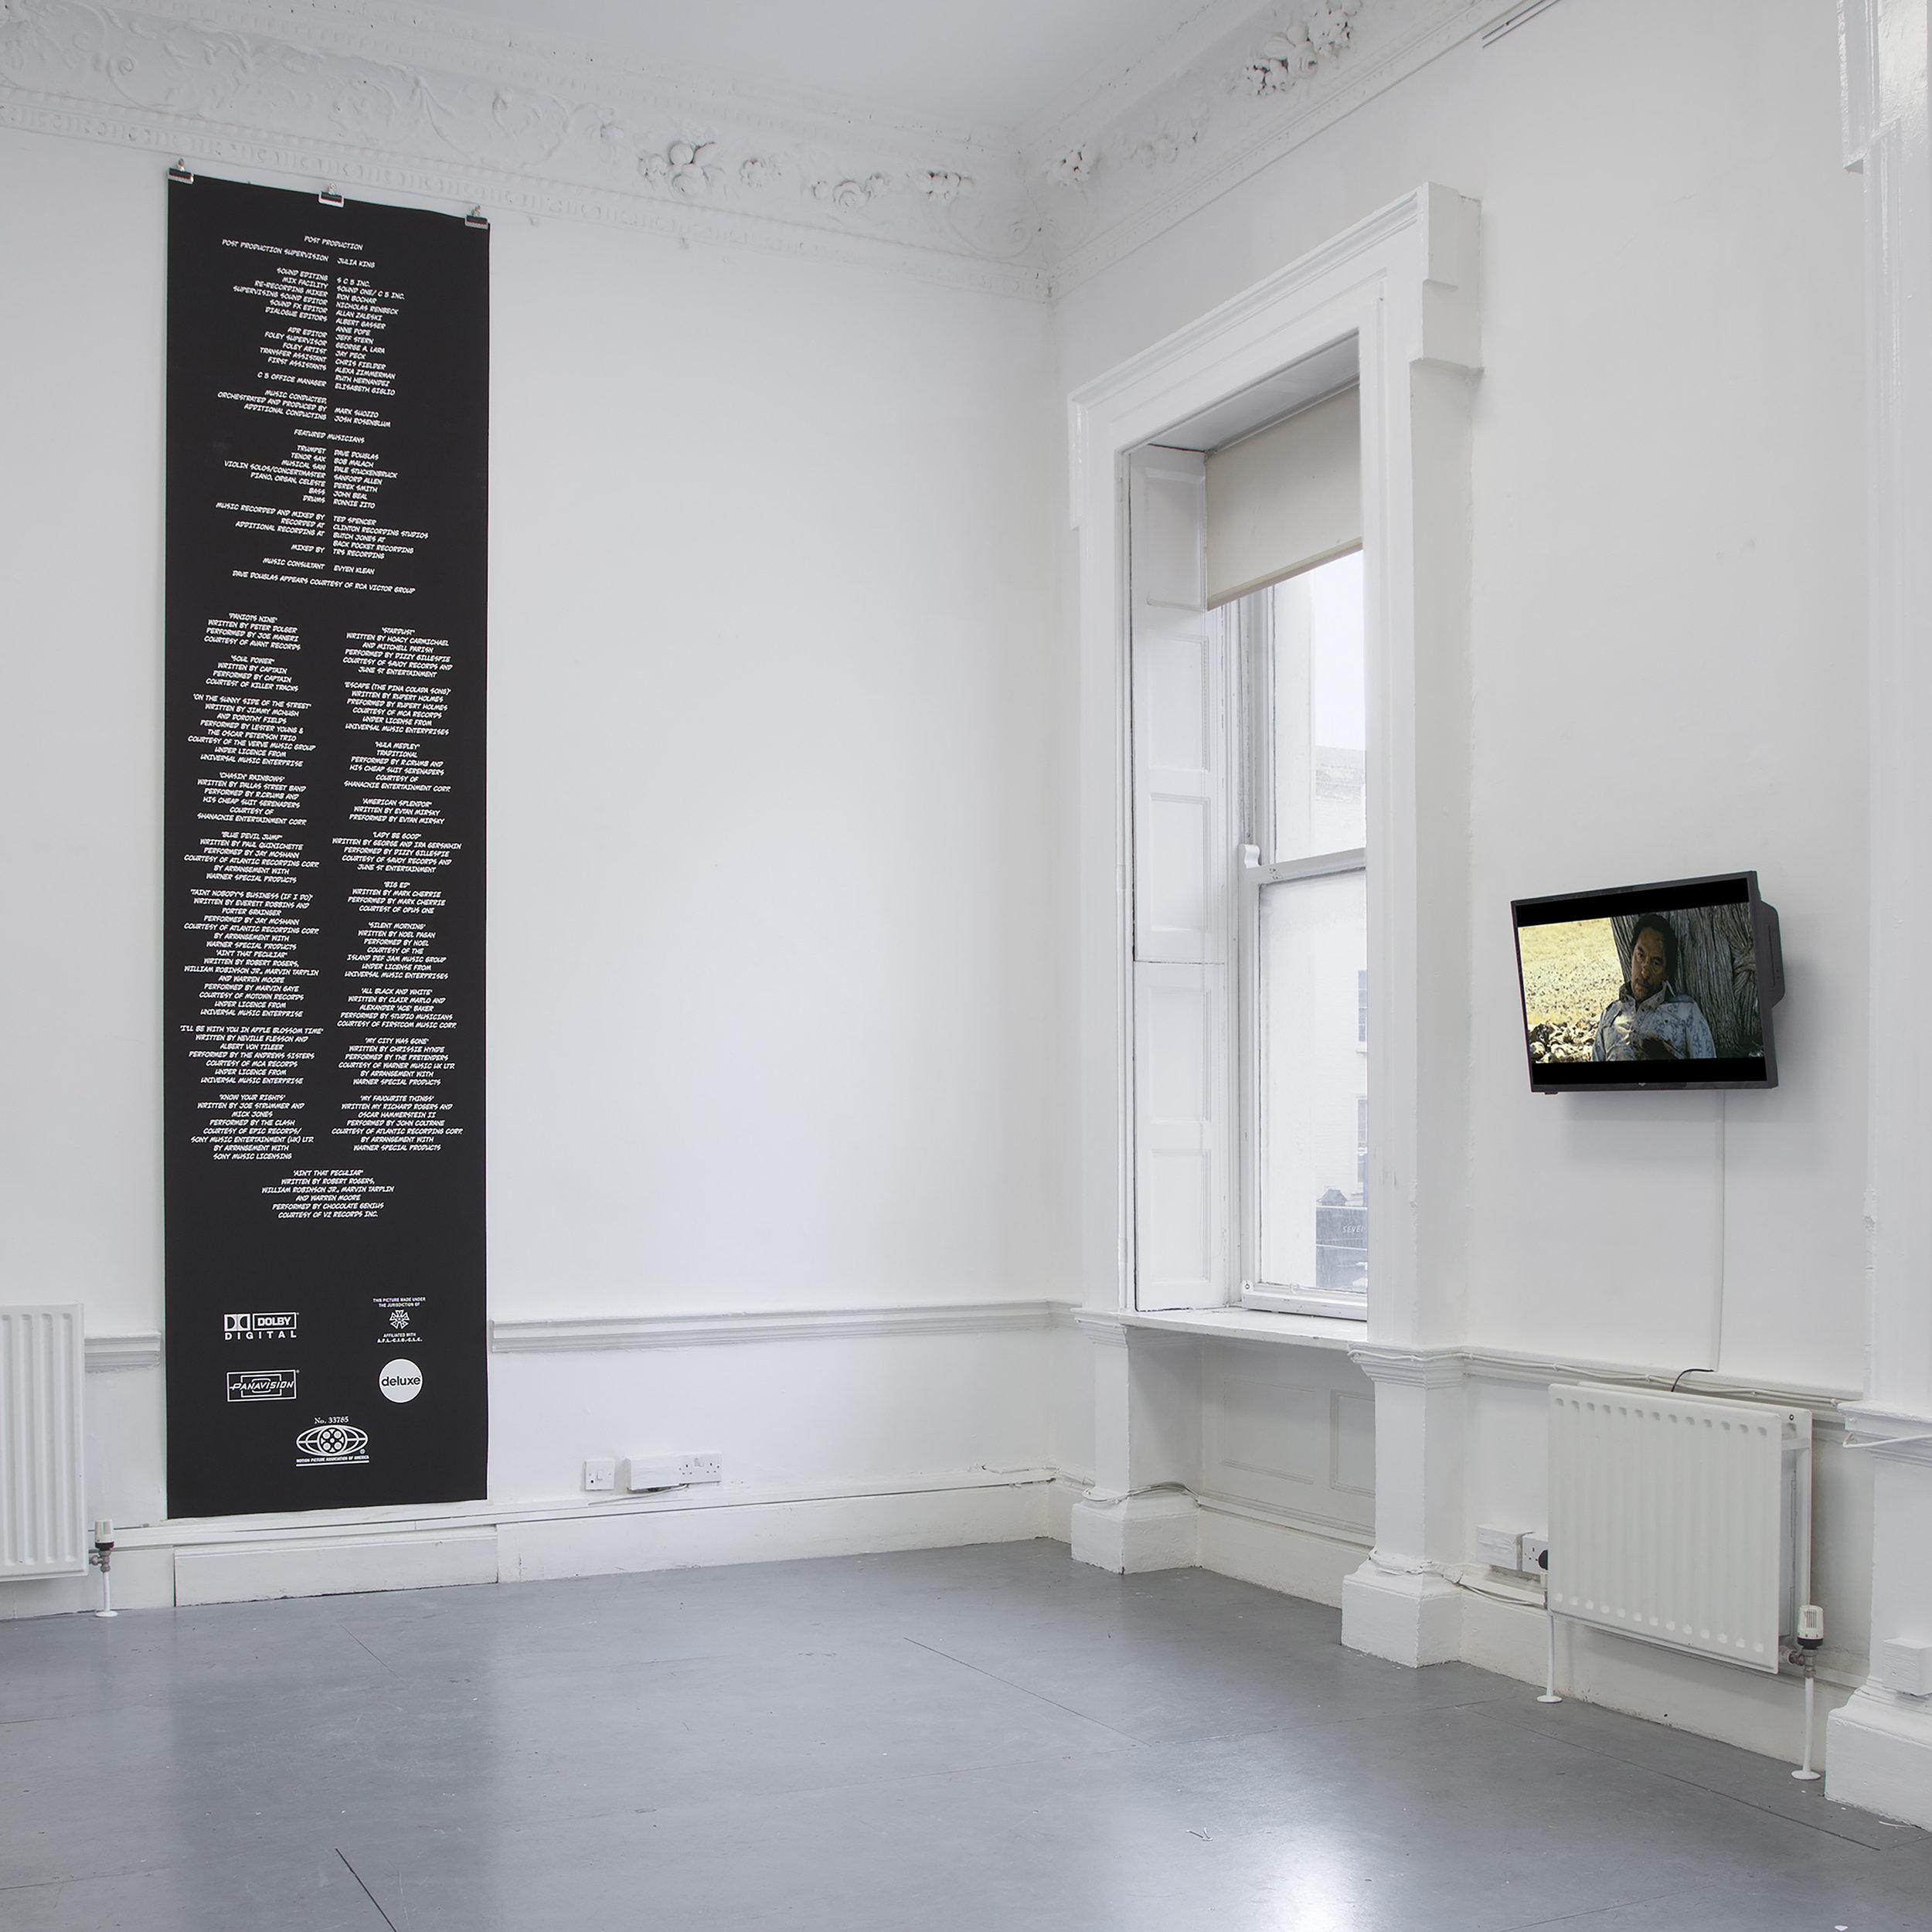 7_Noel Hensey_So Your Going To Die_Exhibition Installation_1 .jpg